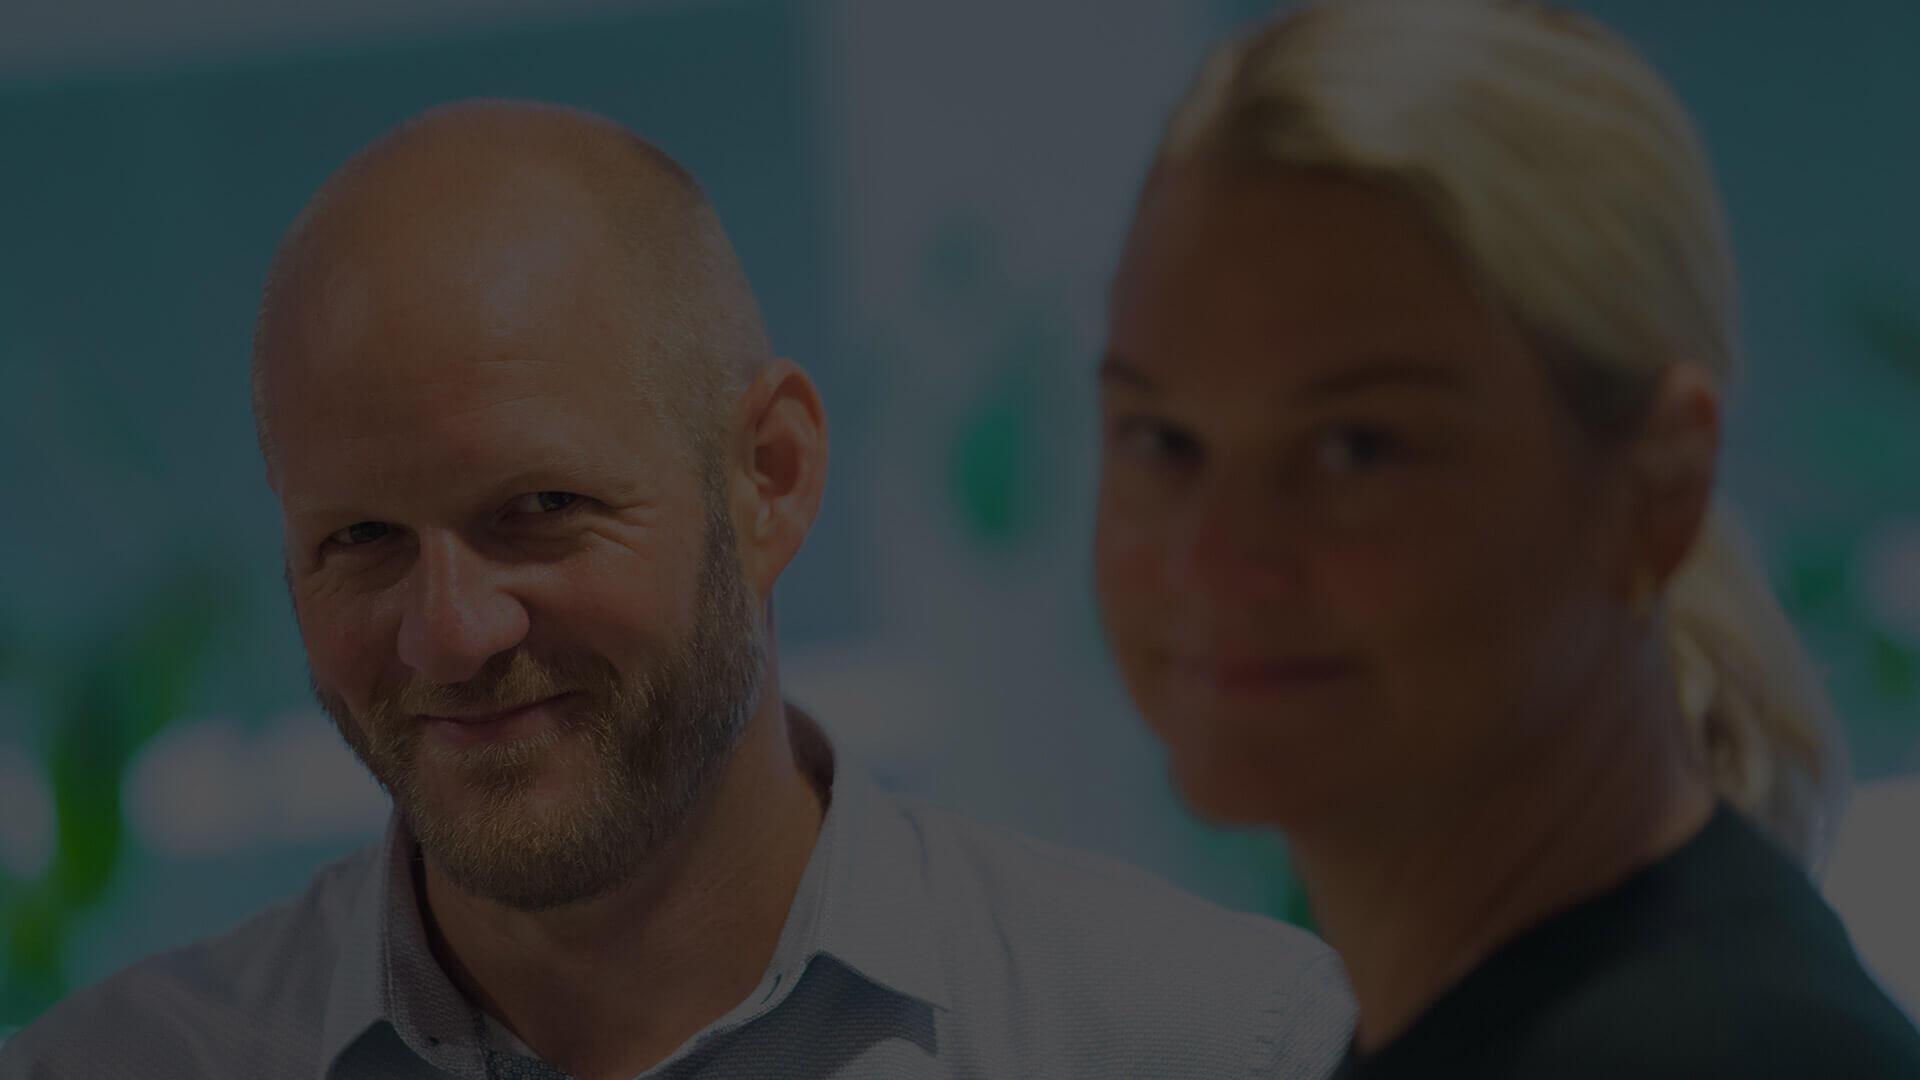 Circom-it-support-blekinge-karlshamn-Marcus-Anna-Karin